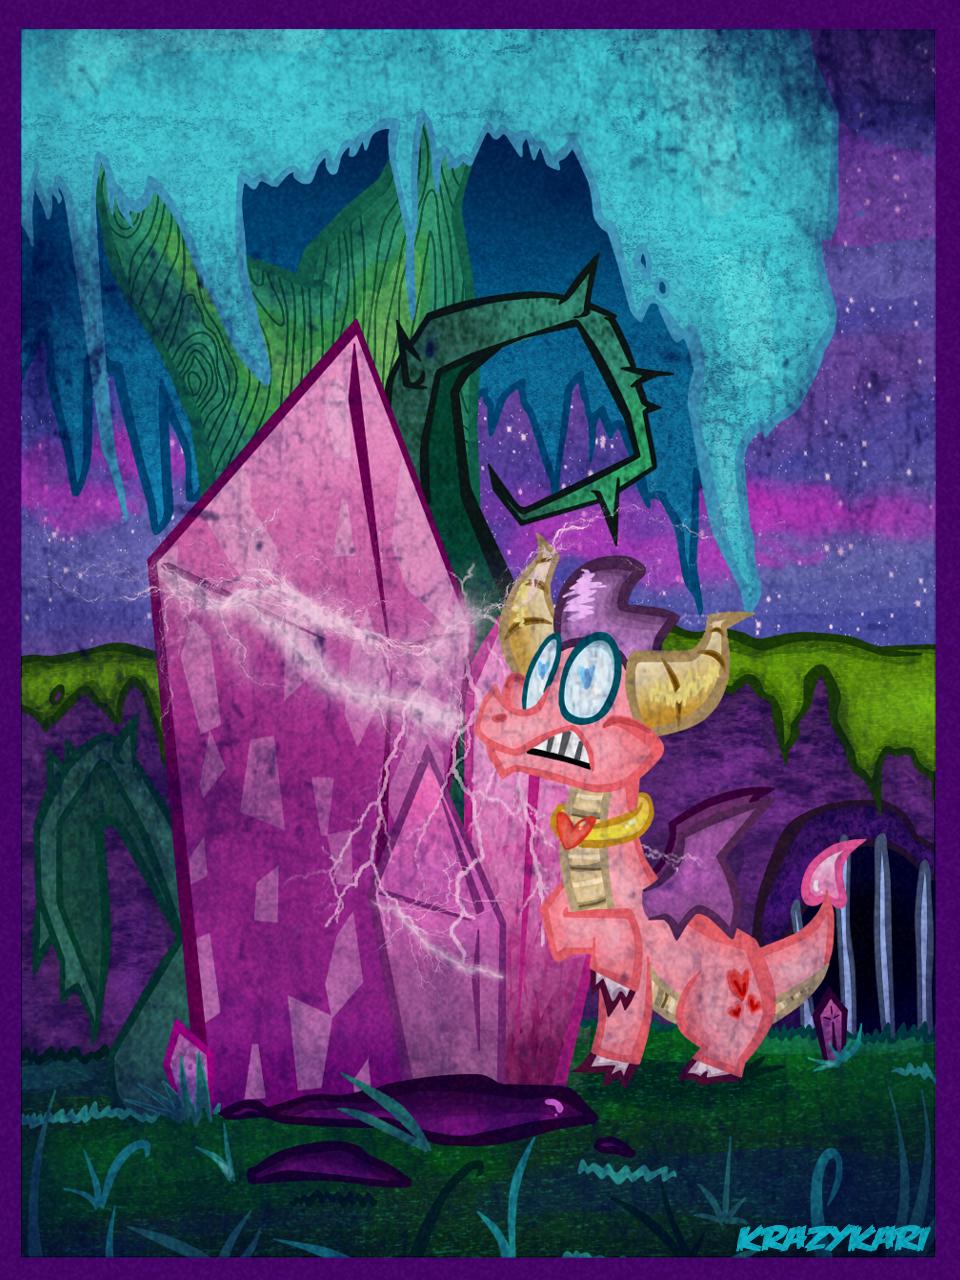 (Spyro the Dragon) Dark Gems